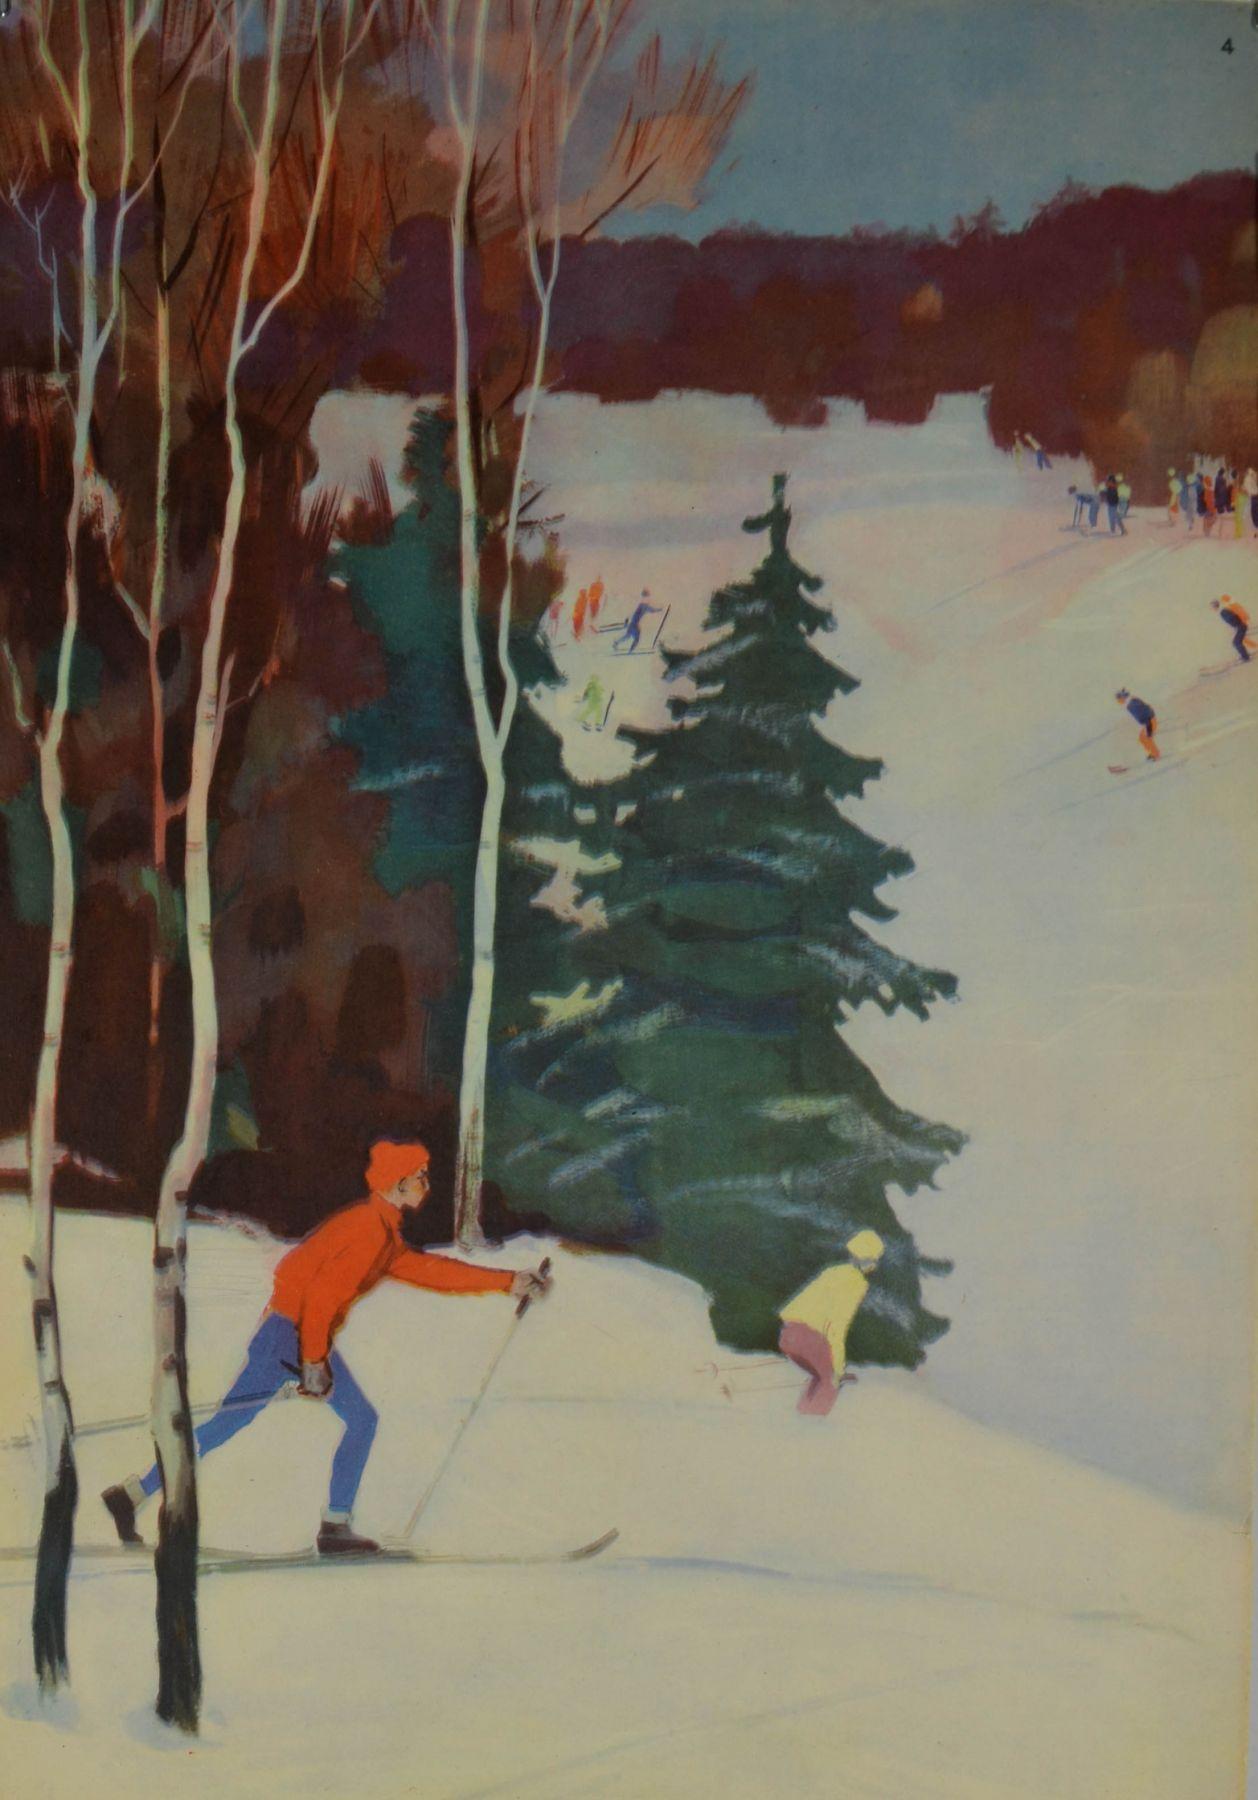 Зима. Лыжник.